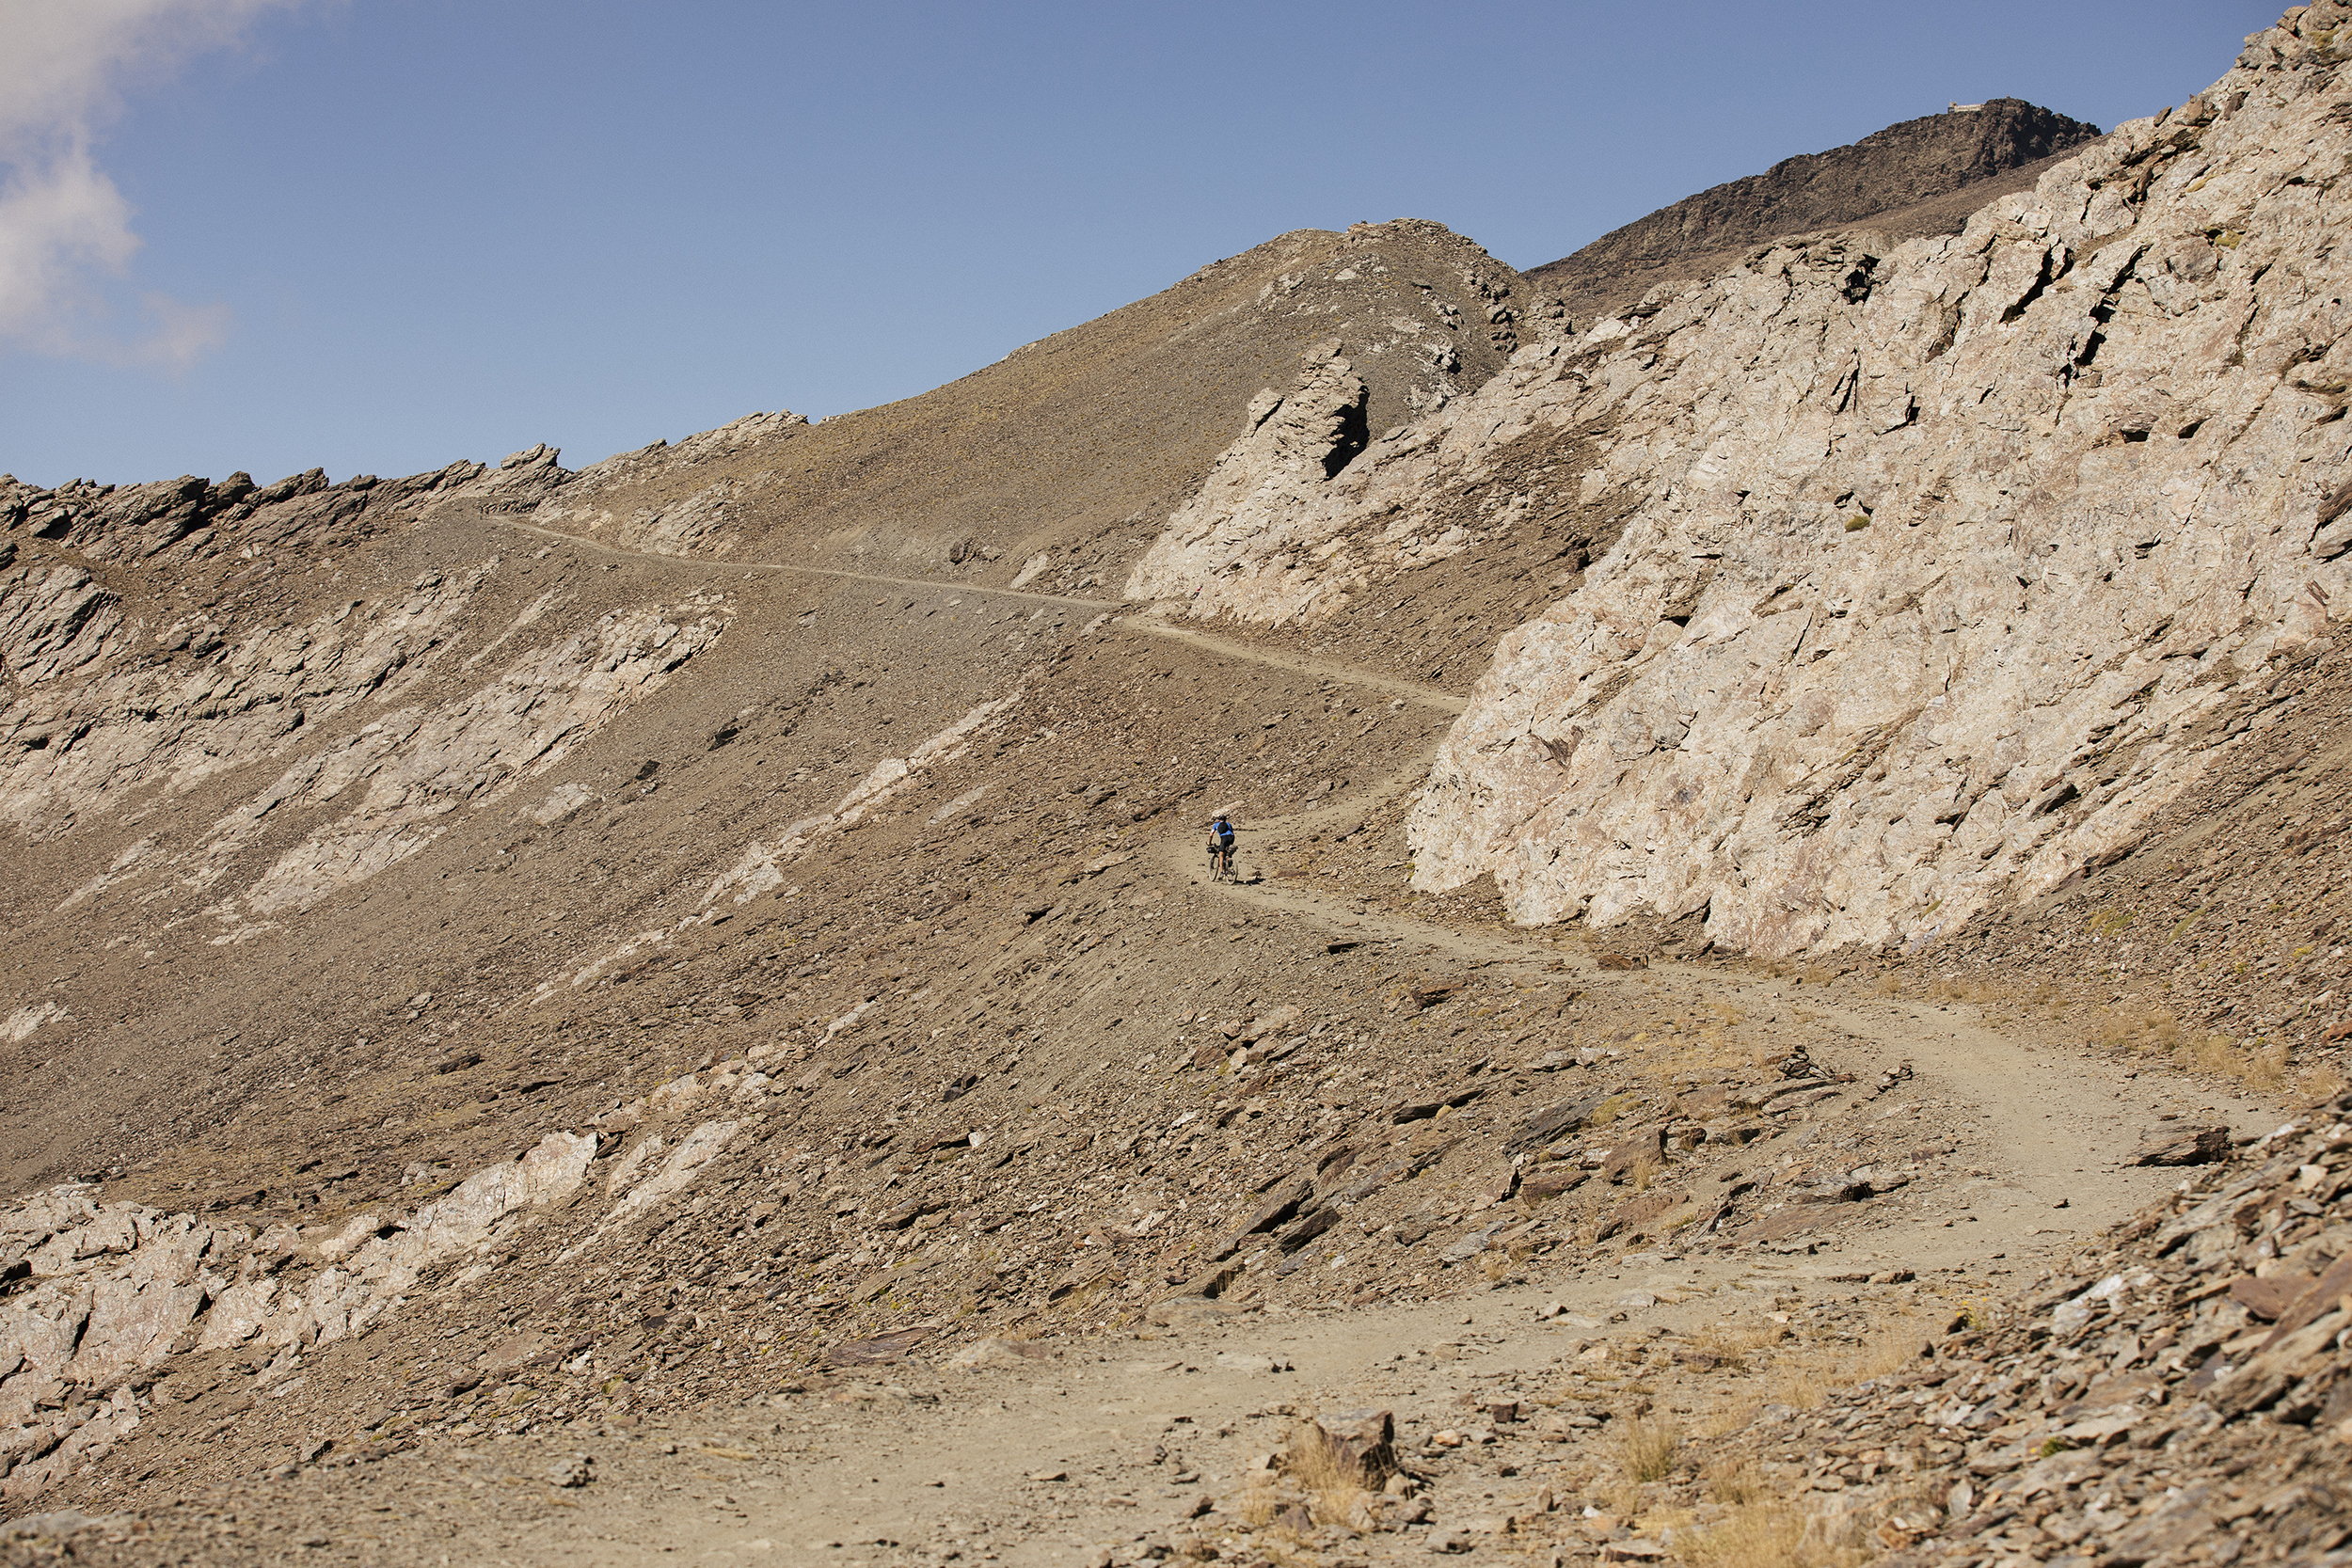 Badlands gravel endurance race